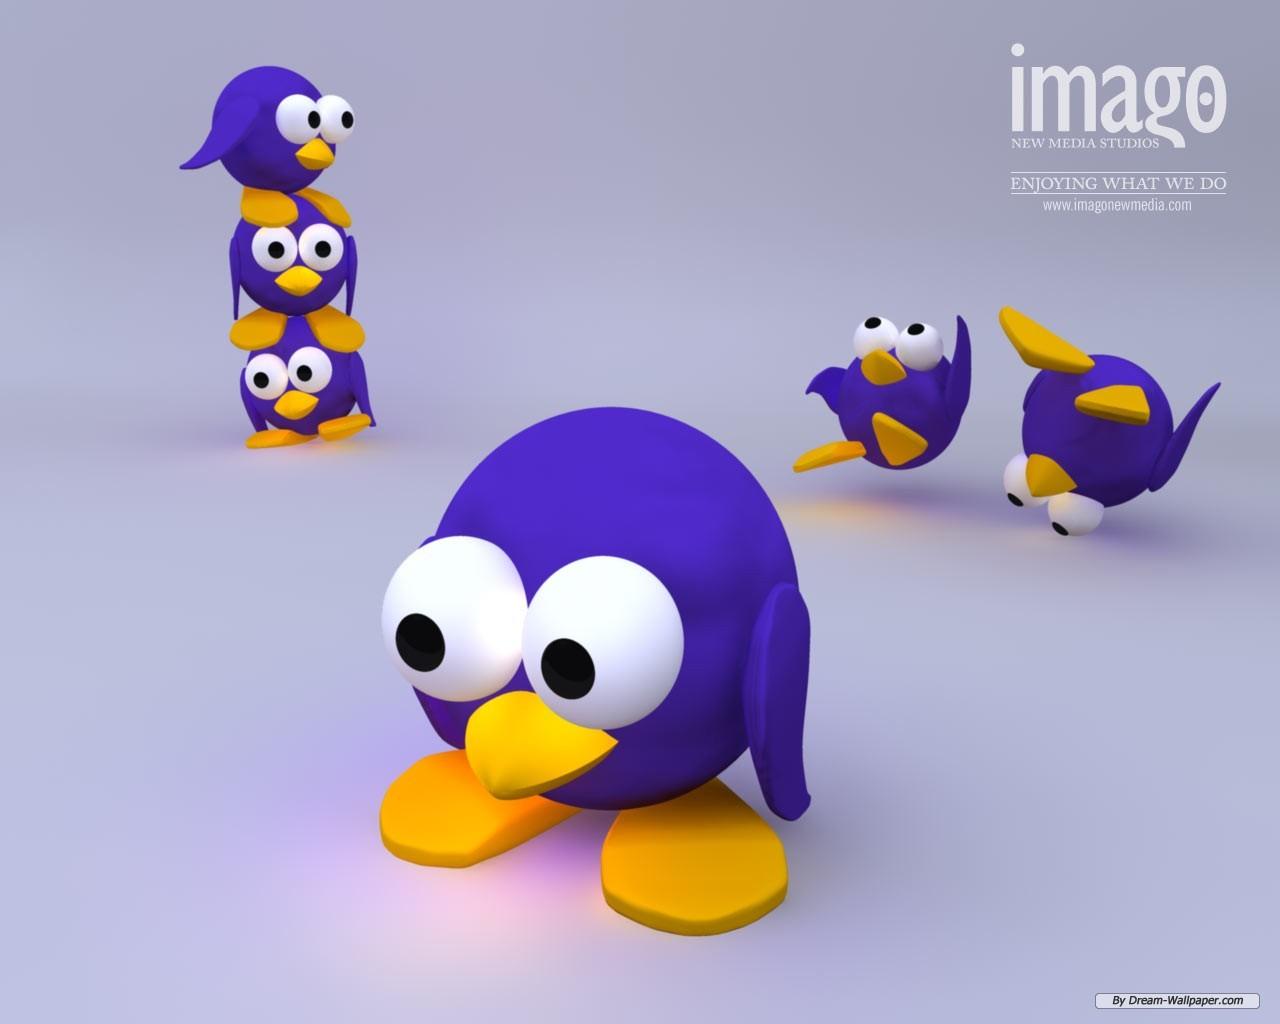 Cute Cartoon Backgrounds Free Download: Cute Cartoon Wallpapers For Desktop